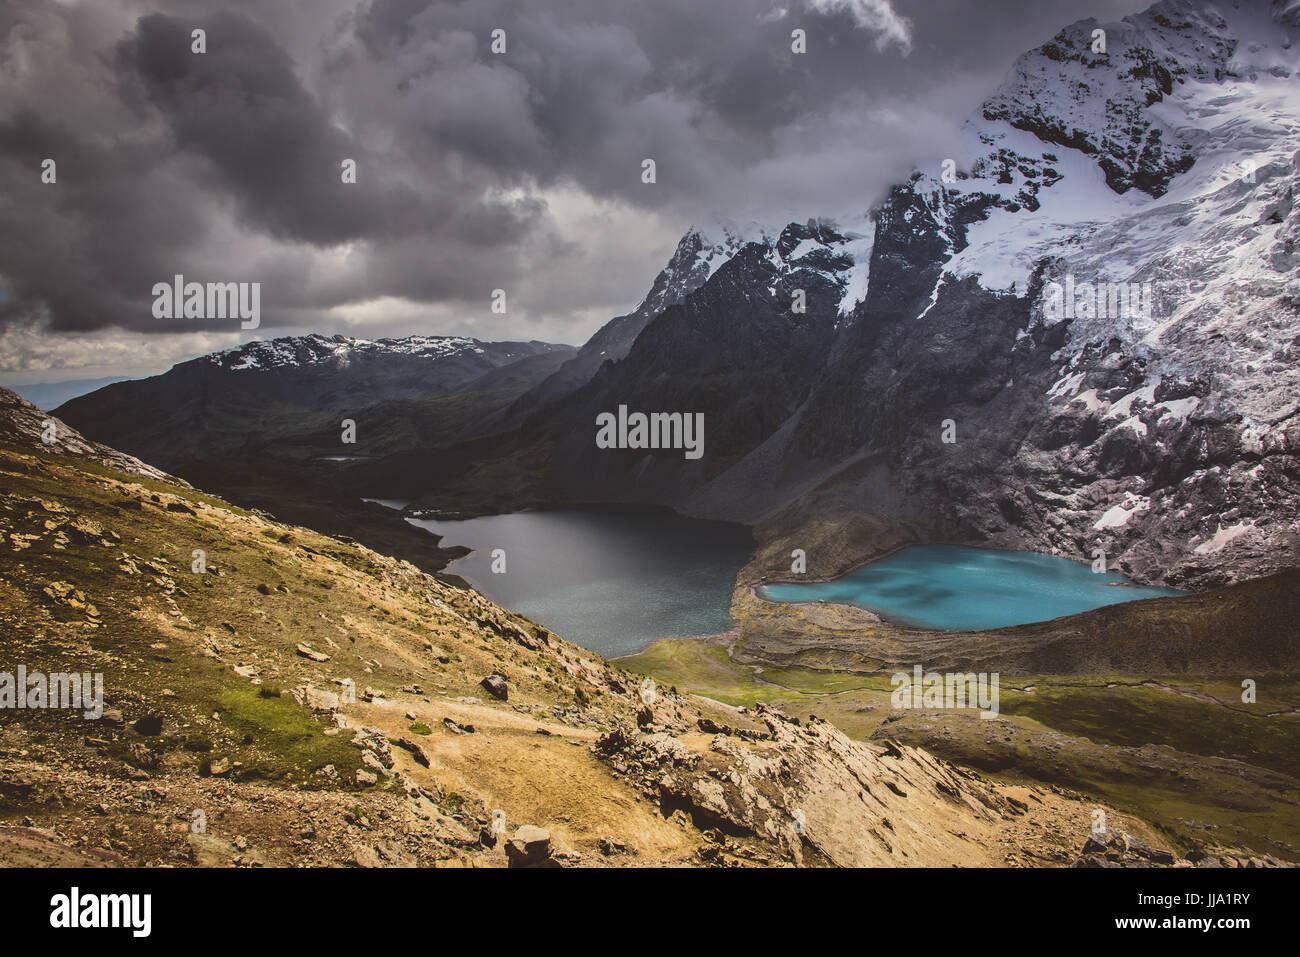 Ausangate glaciale gamma di montagna & laghi, Perù Immagini Stock